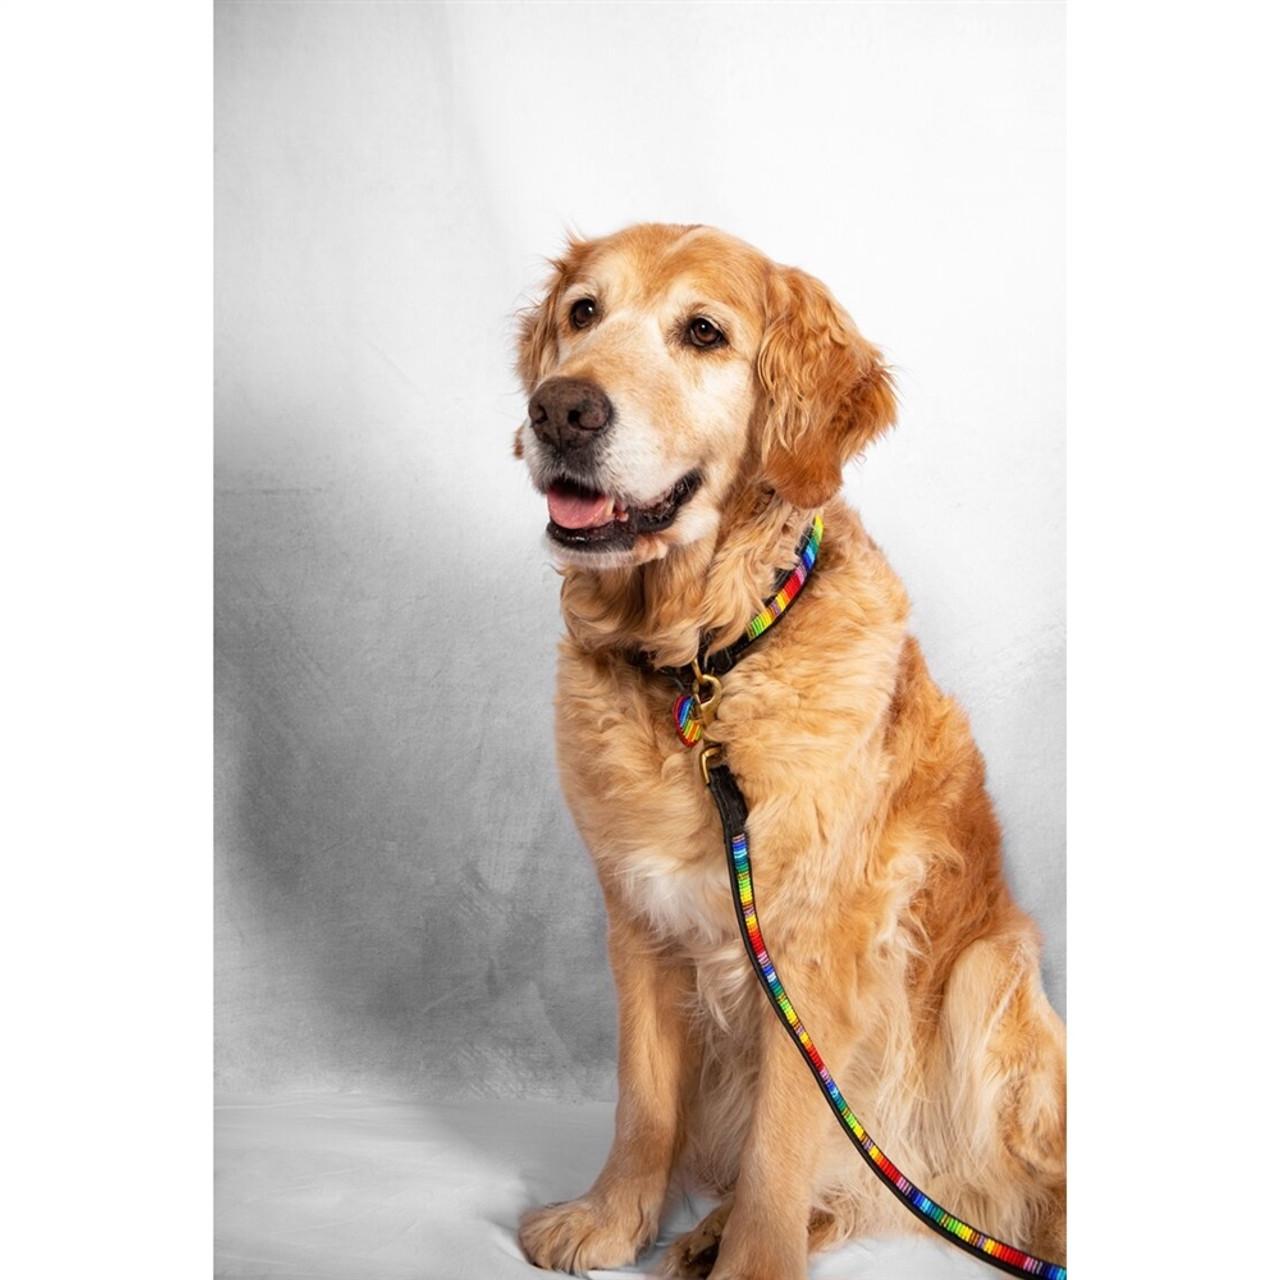 Rainbow Dog Leash - Handmade in Kenya